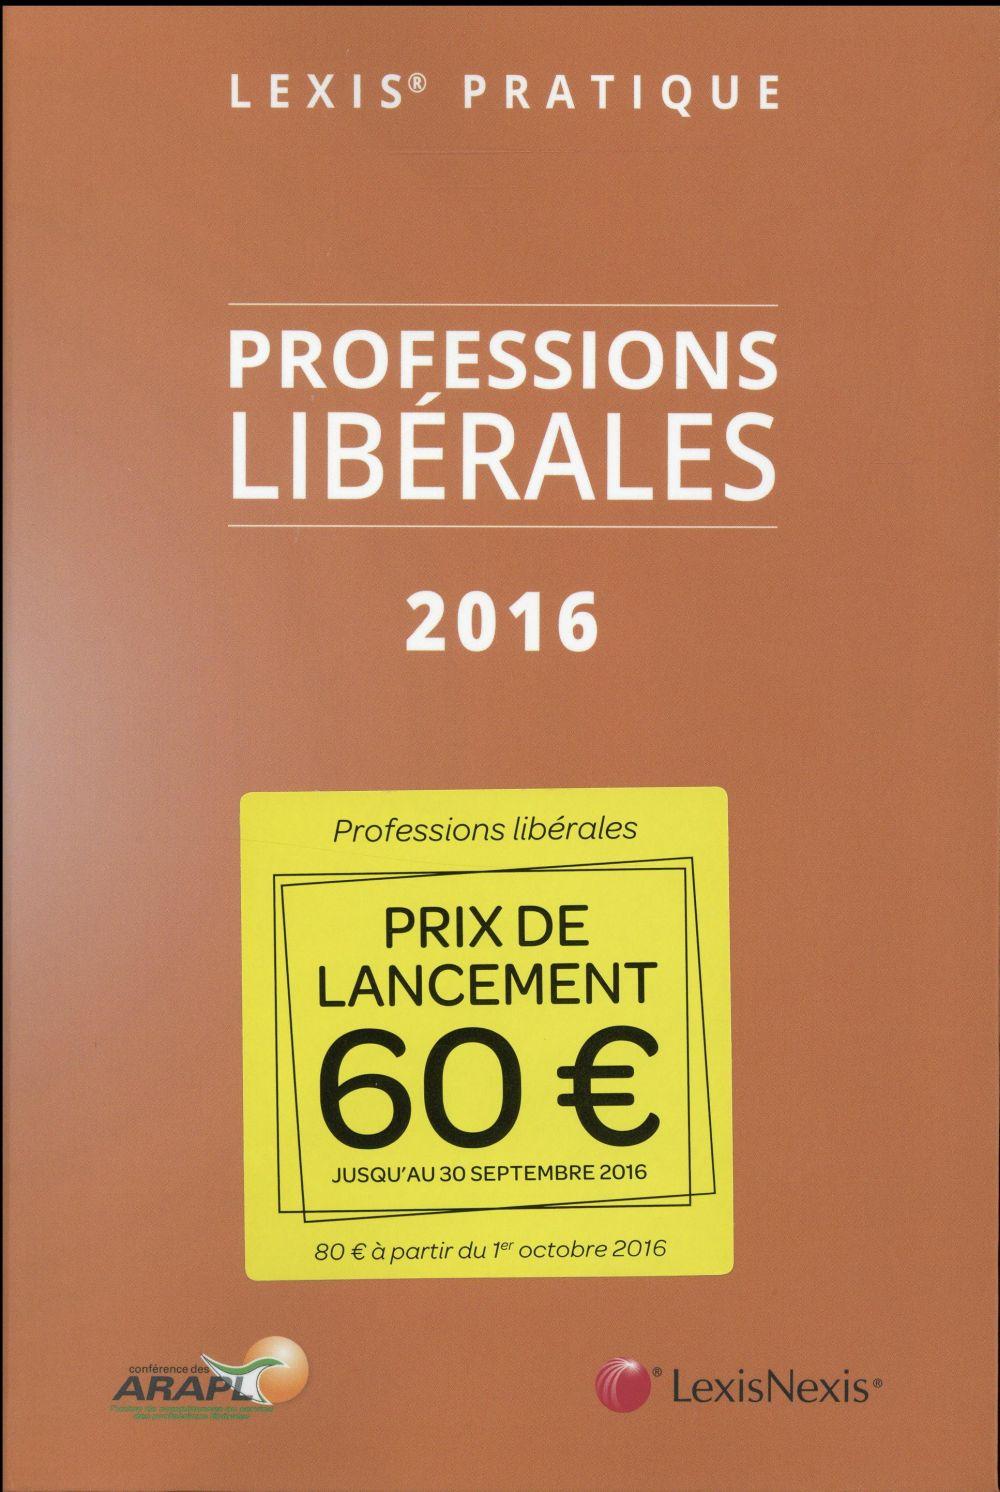 LEXIS PRATIQUE PROFESSIONS LIBERALES 2016